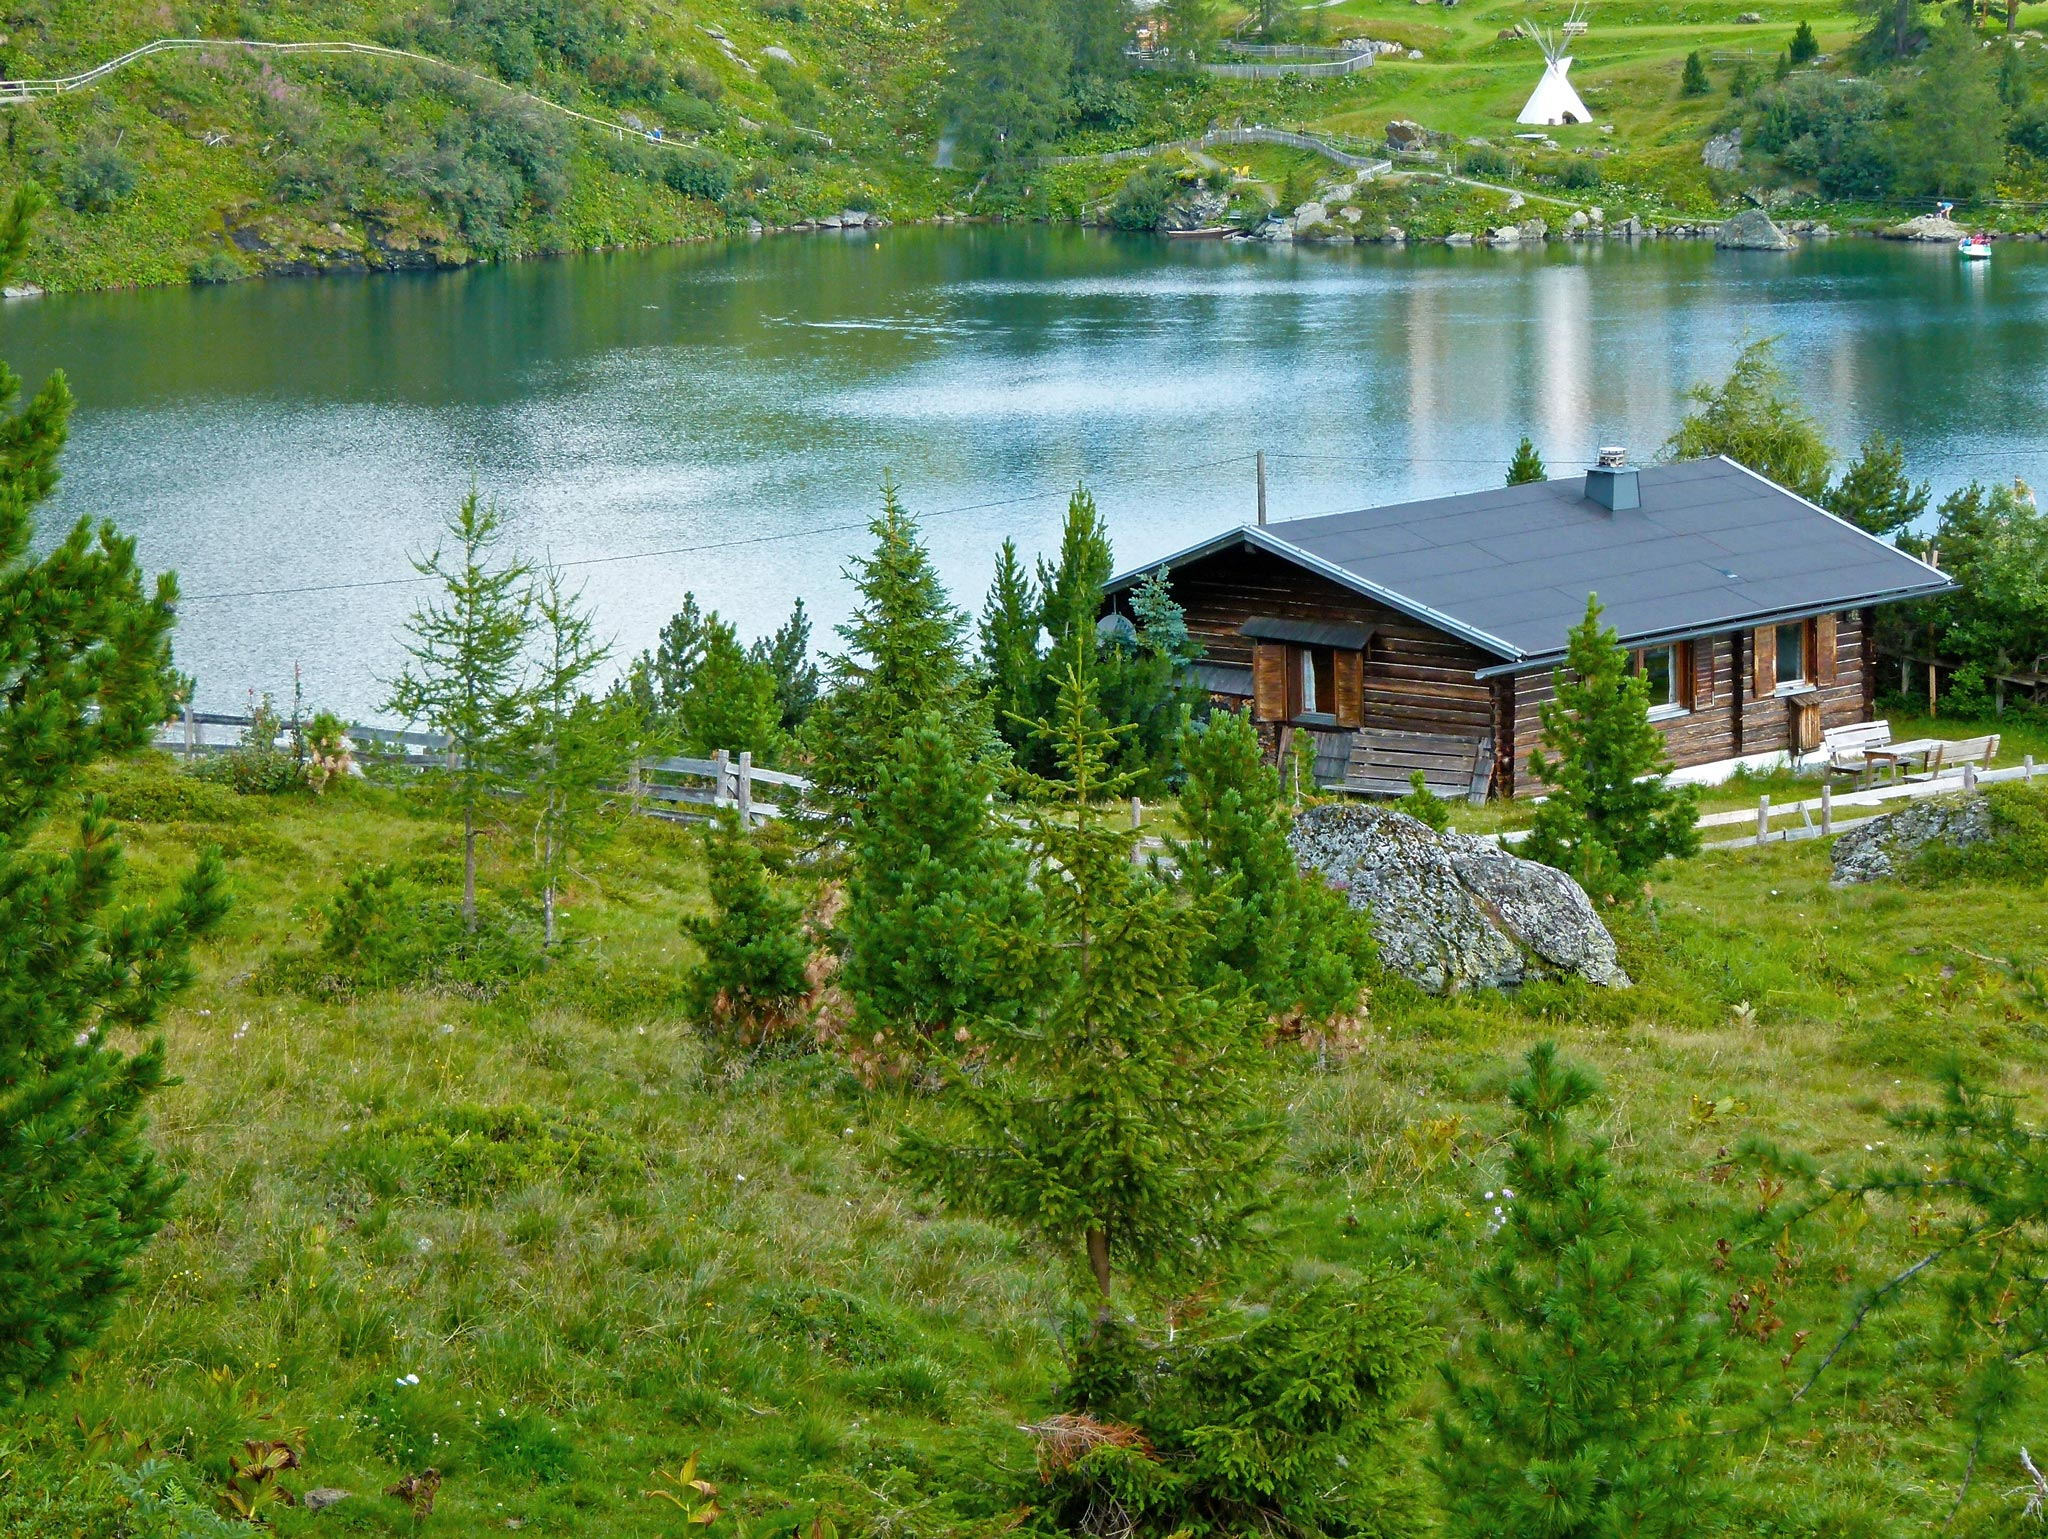 Haus-mit-See_WP1